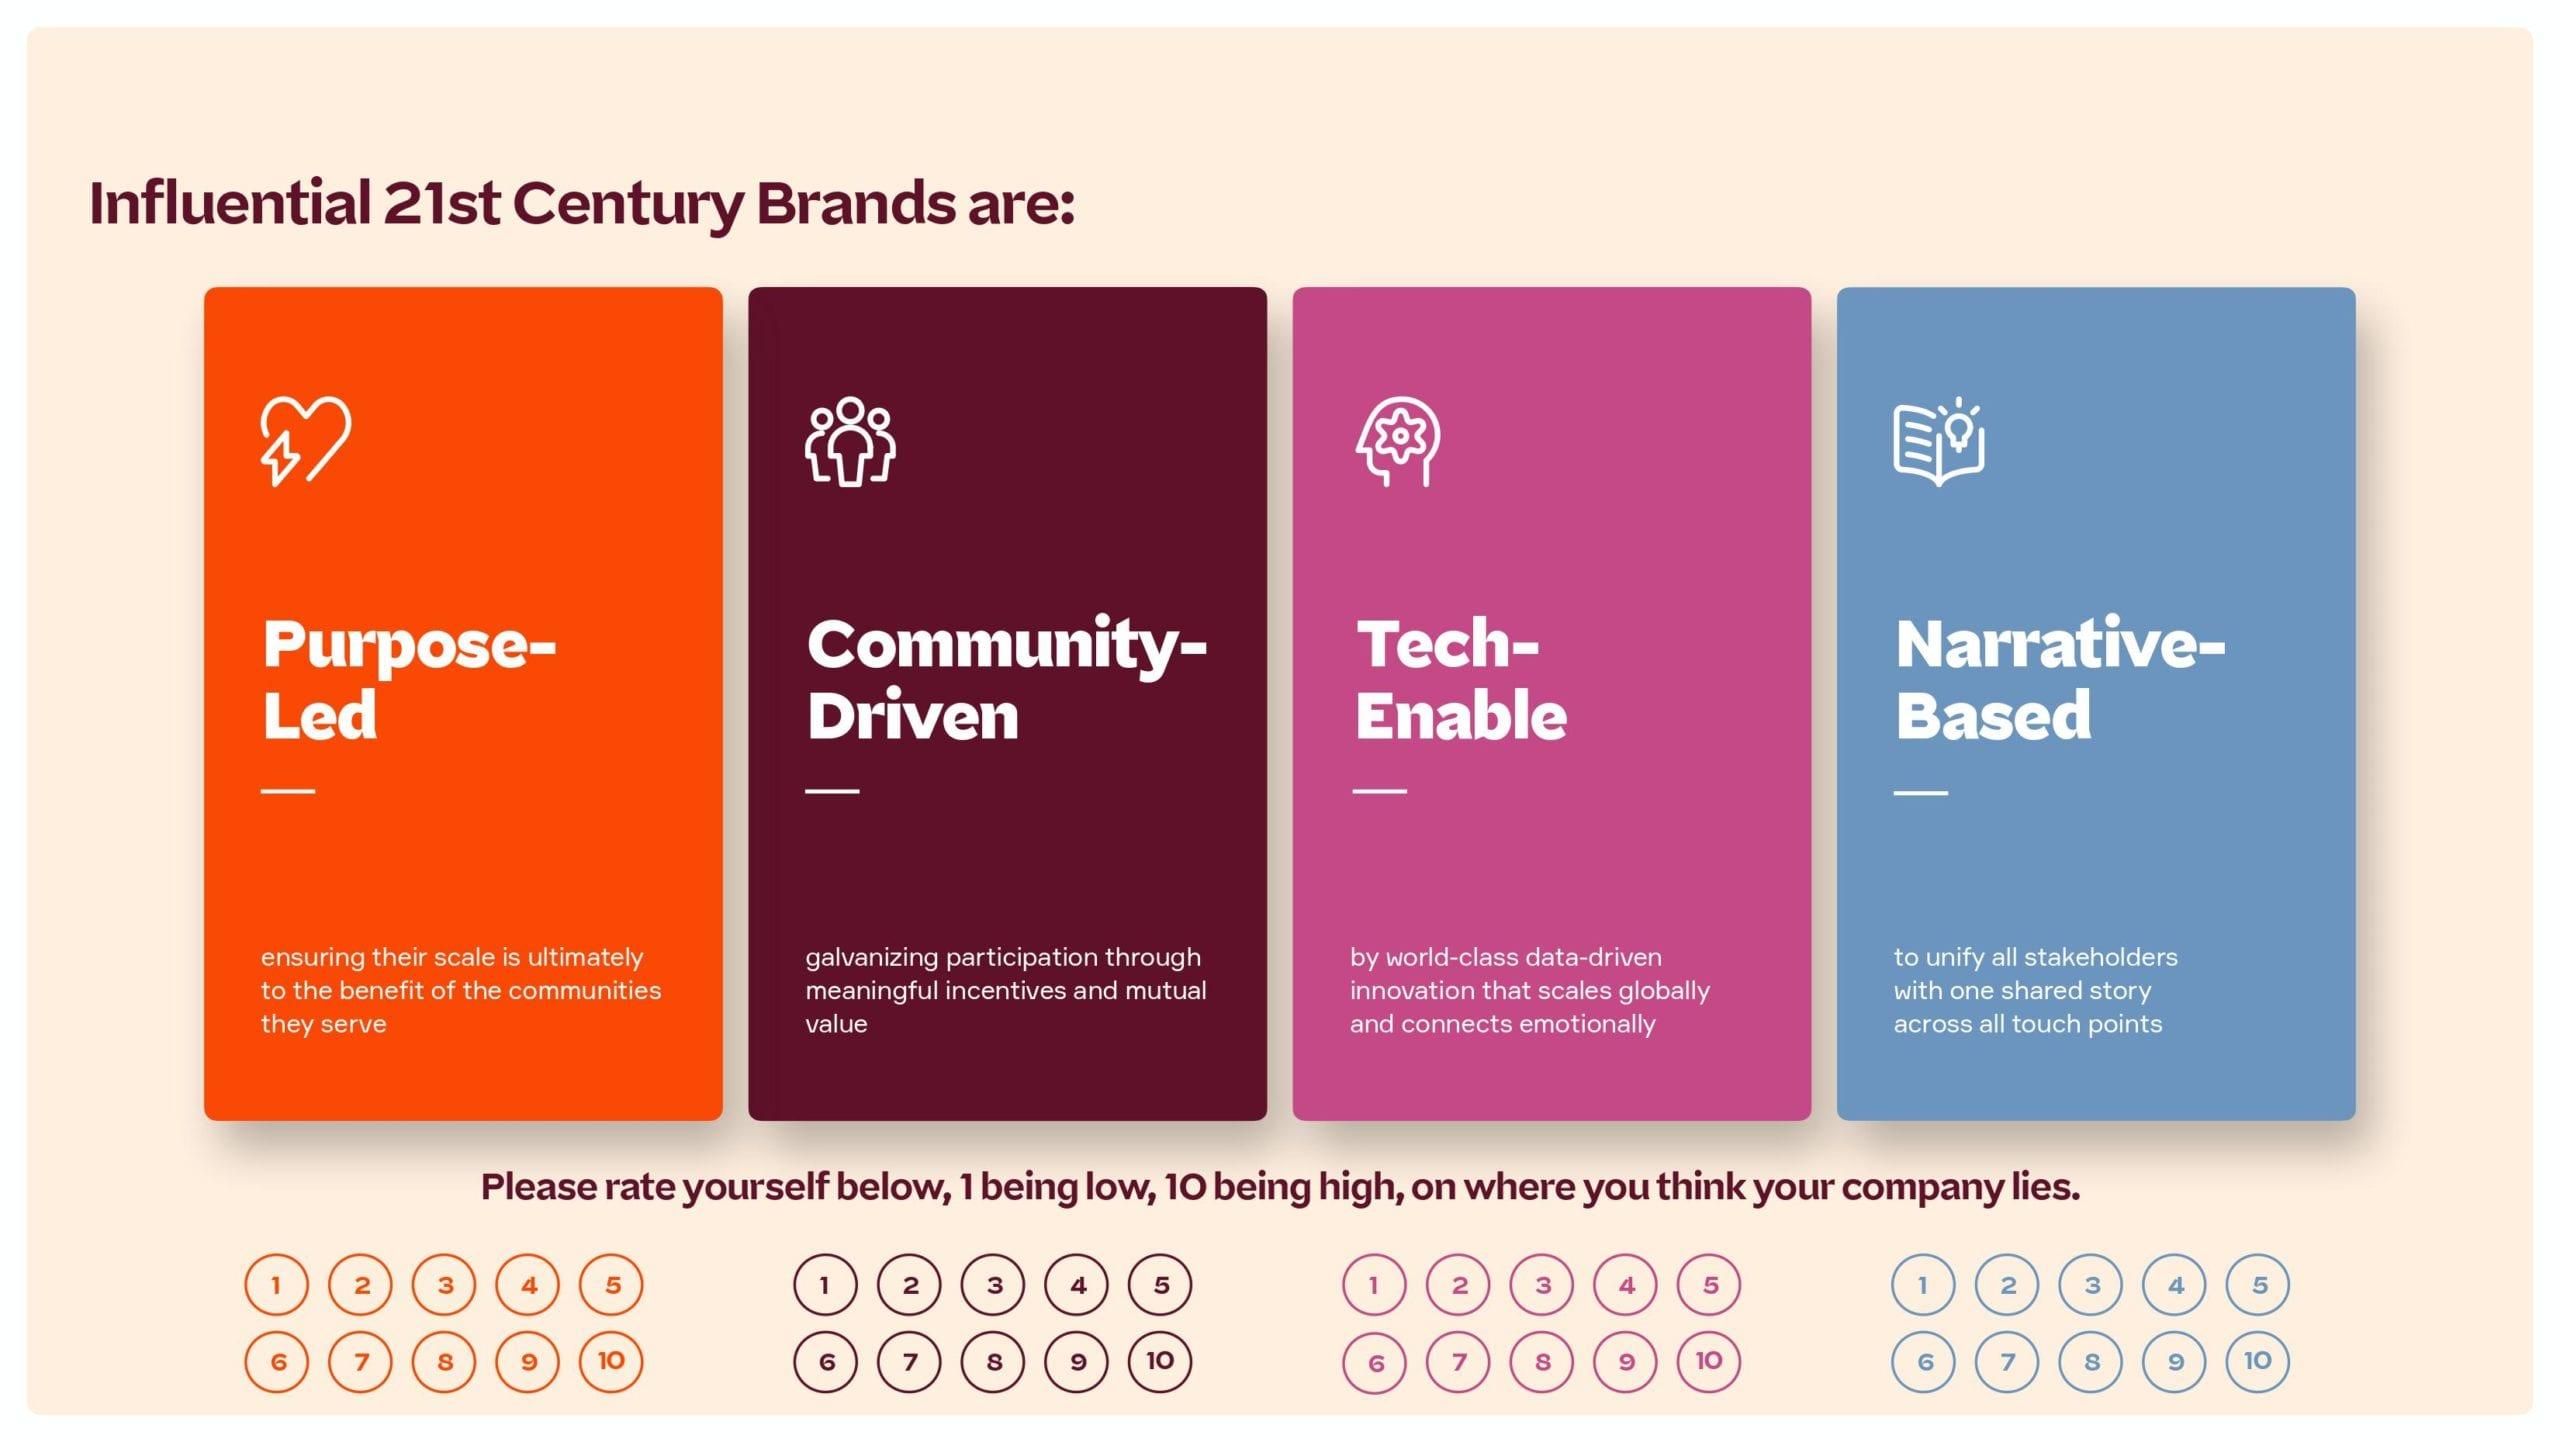 Four Pillars of a 21st Century Brand